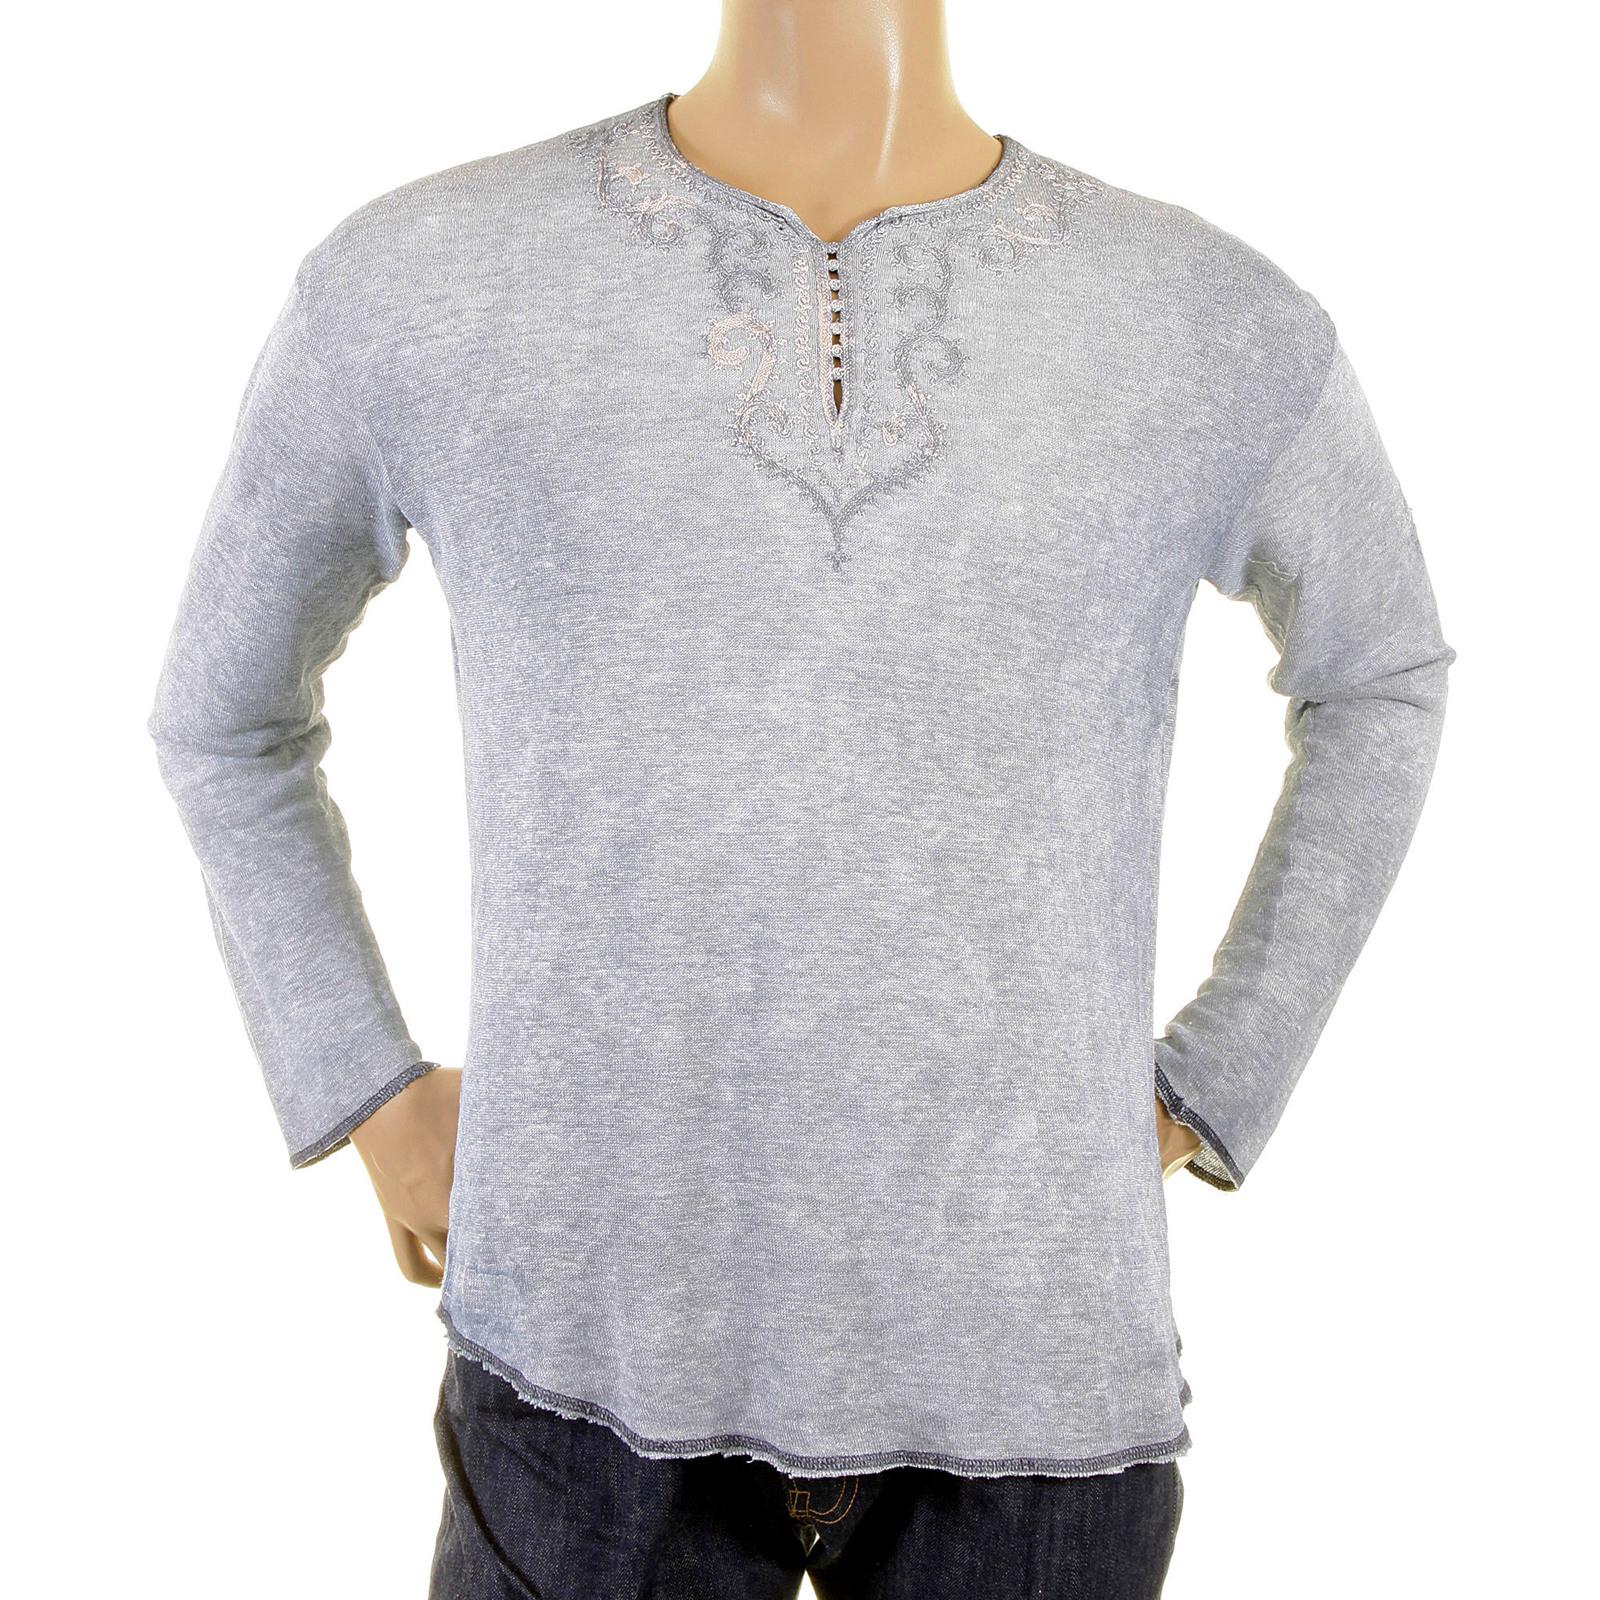 2bcfec22 Armani Jeans t shirts blue grey mesh hemp mix top AJM3612